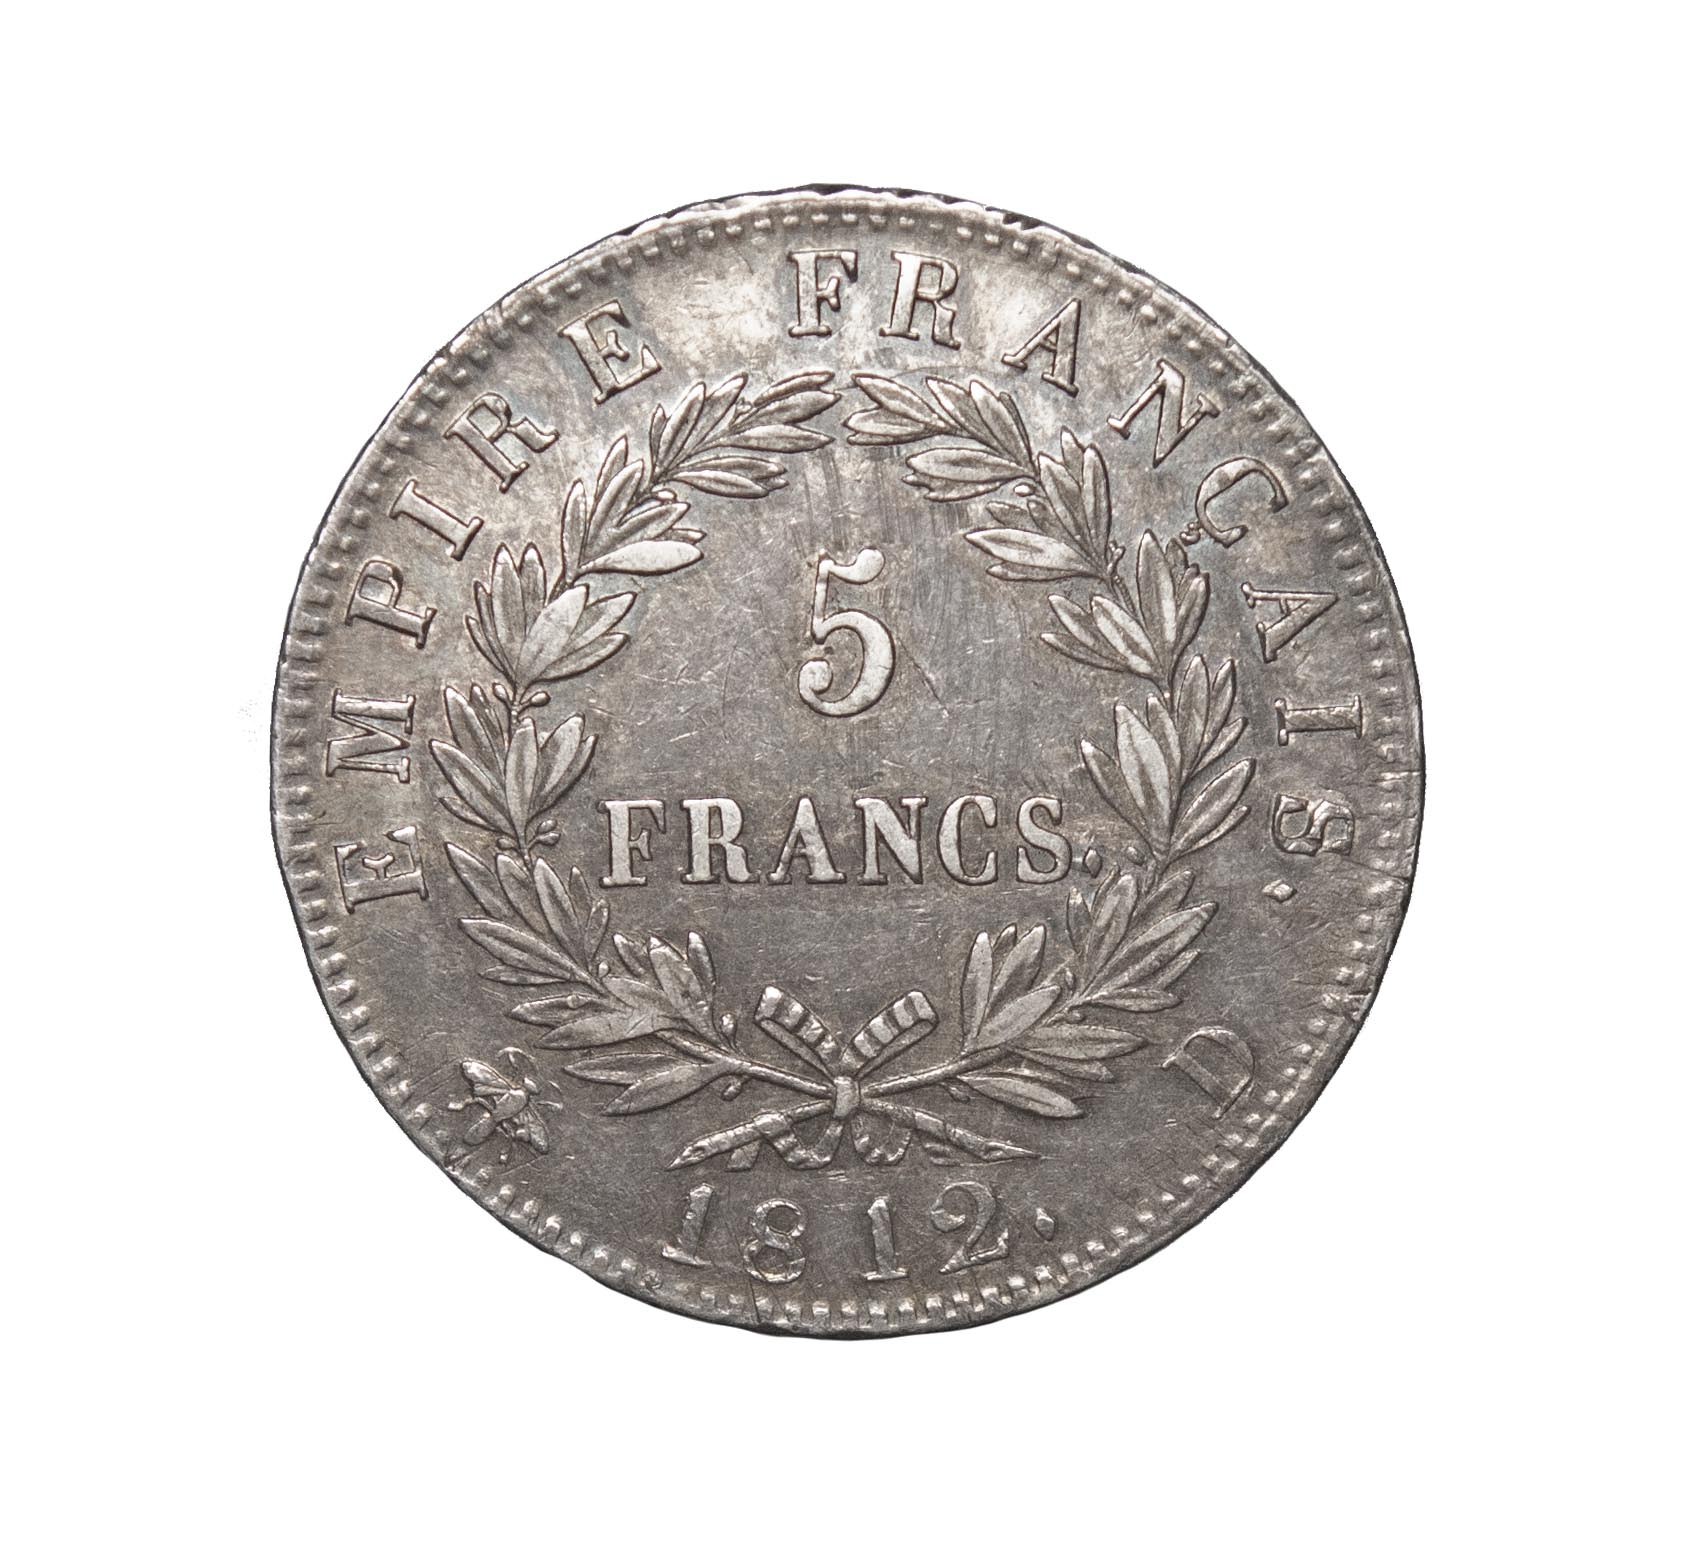 France, First Empire, Napoleon, 5 Francs, 1812 D